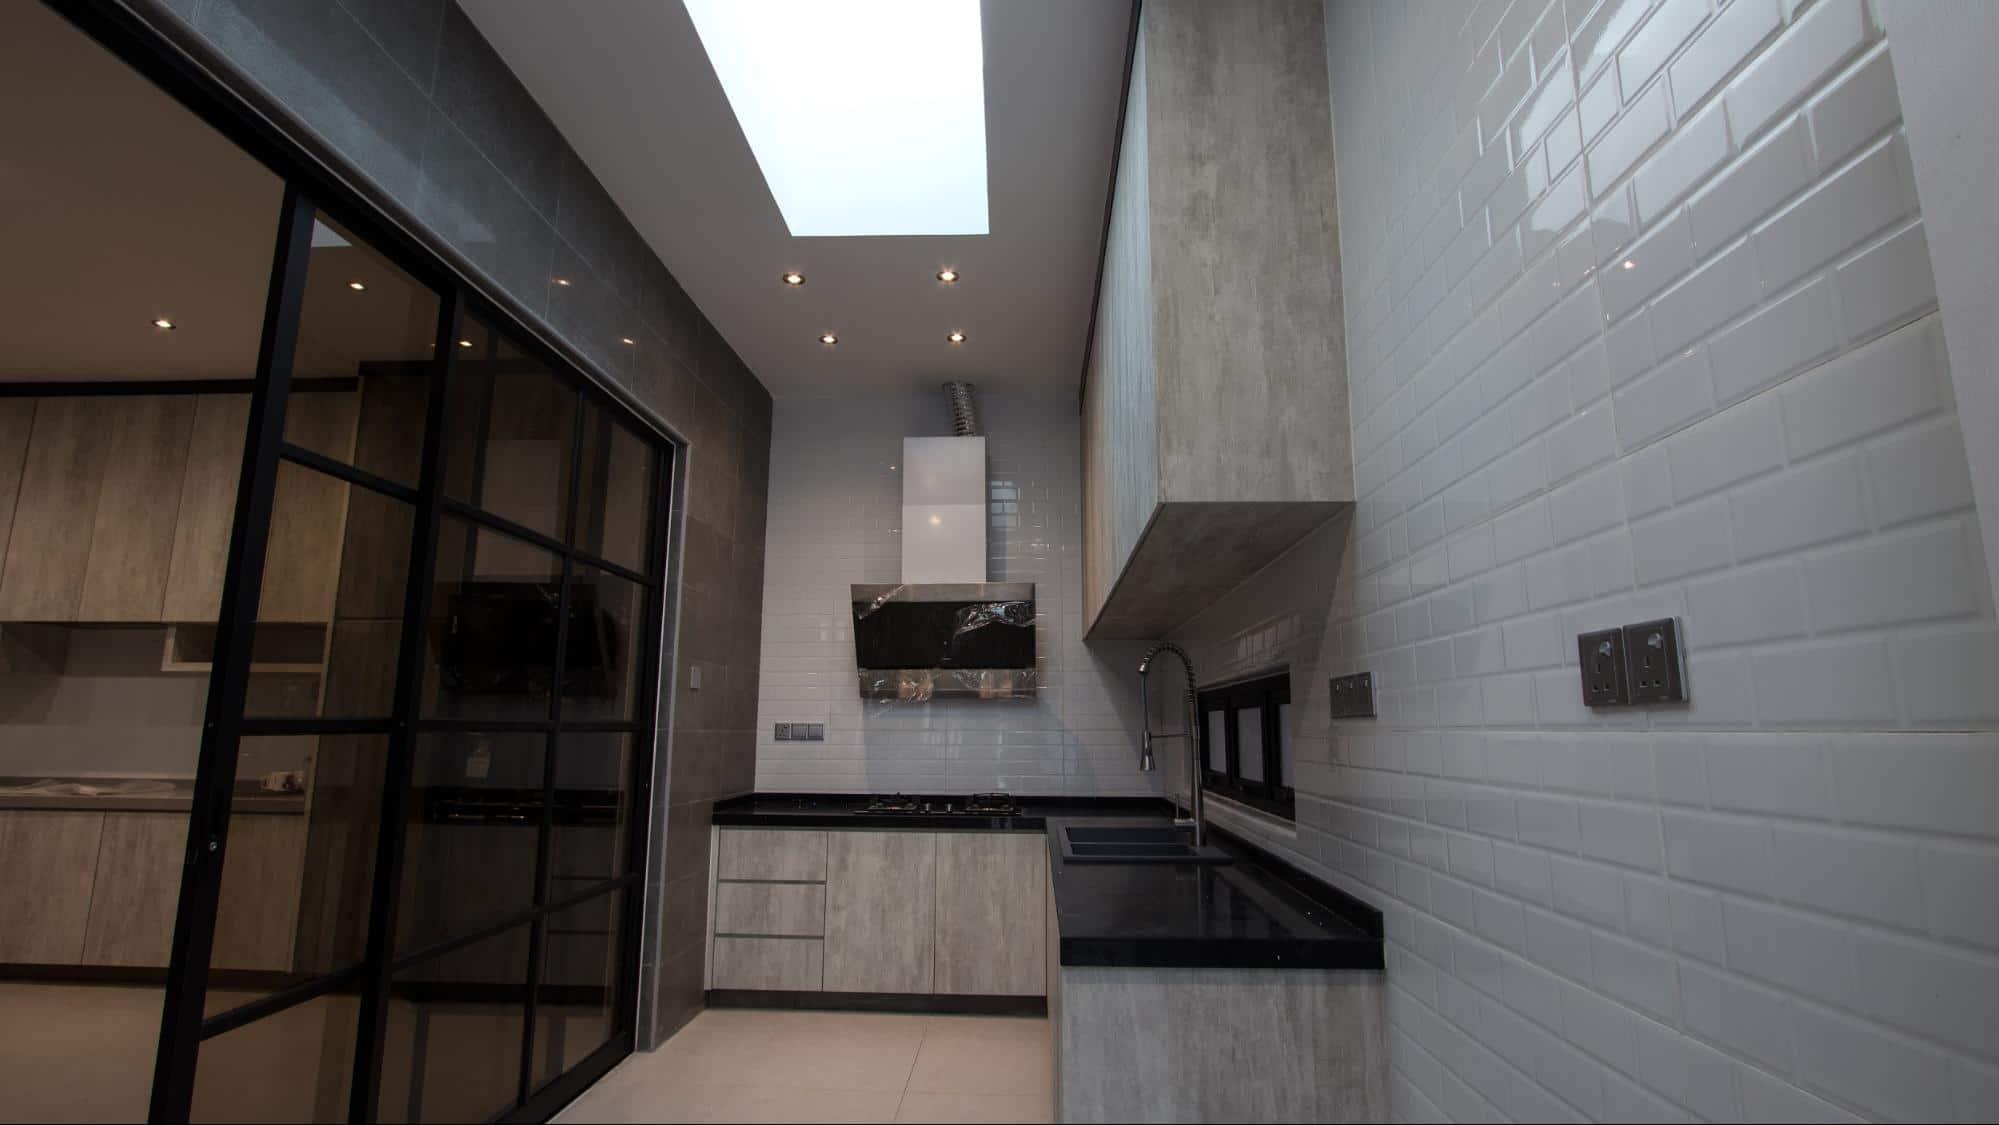 Modern industrial wet kitchen with soft white lighting